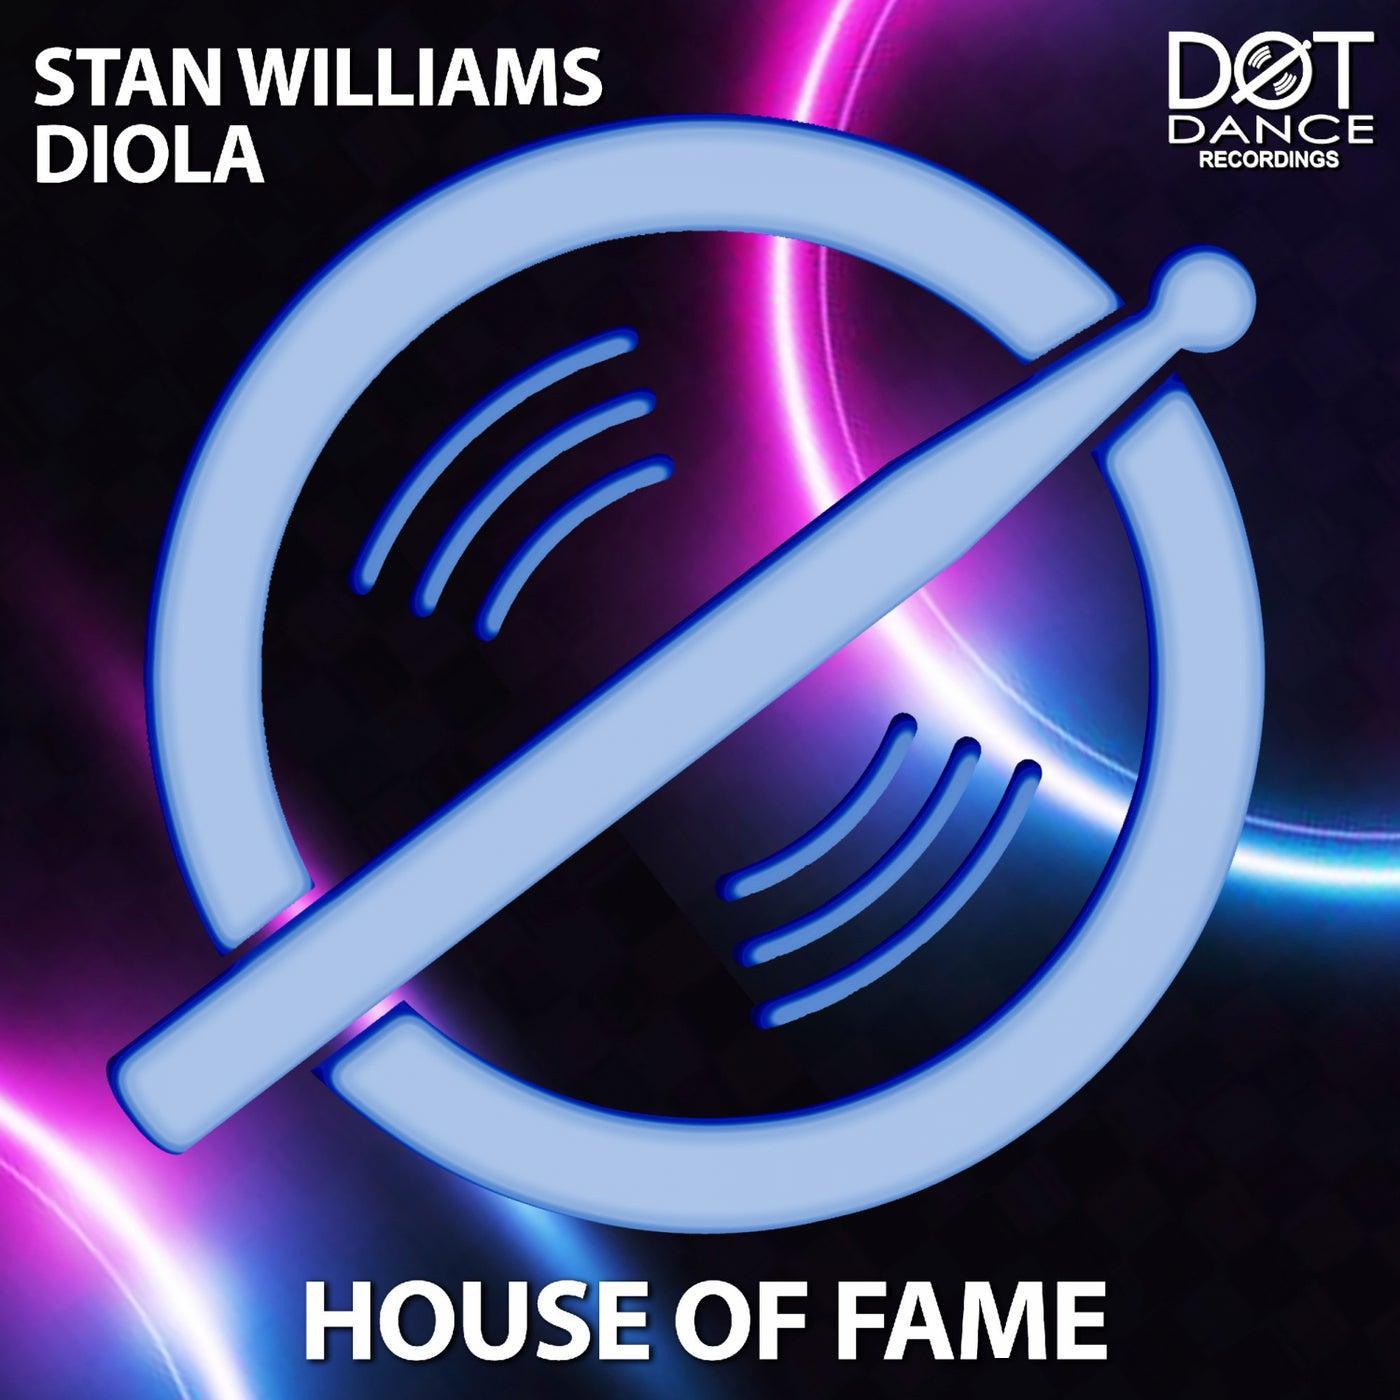 House of Fame (Original Mix)